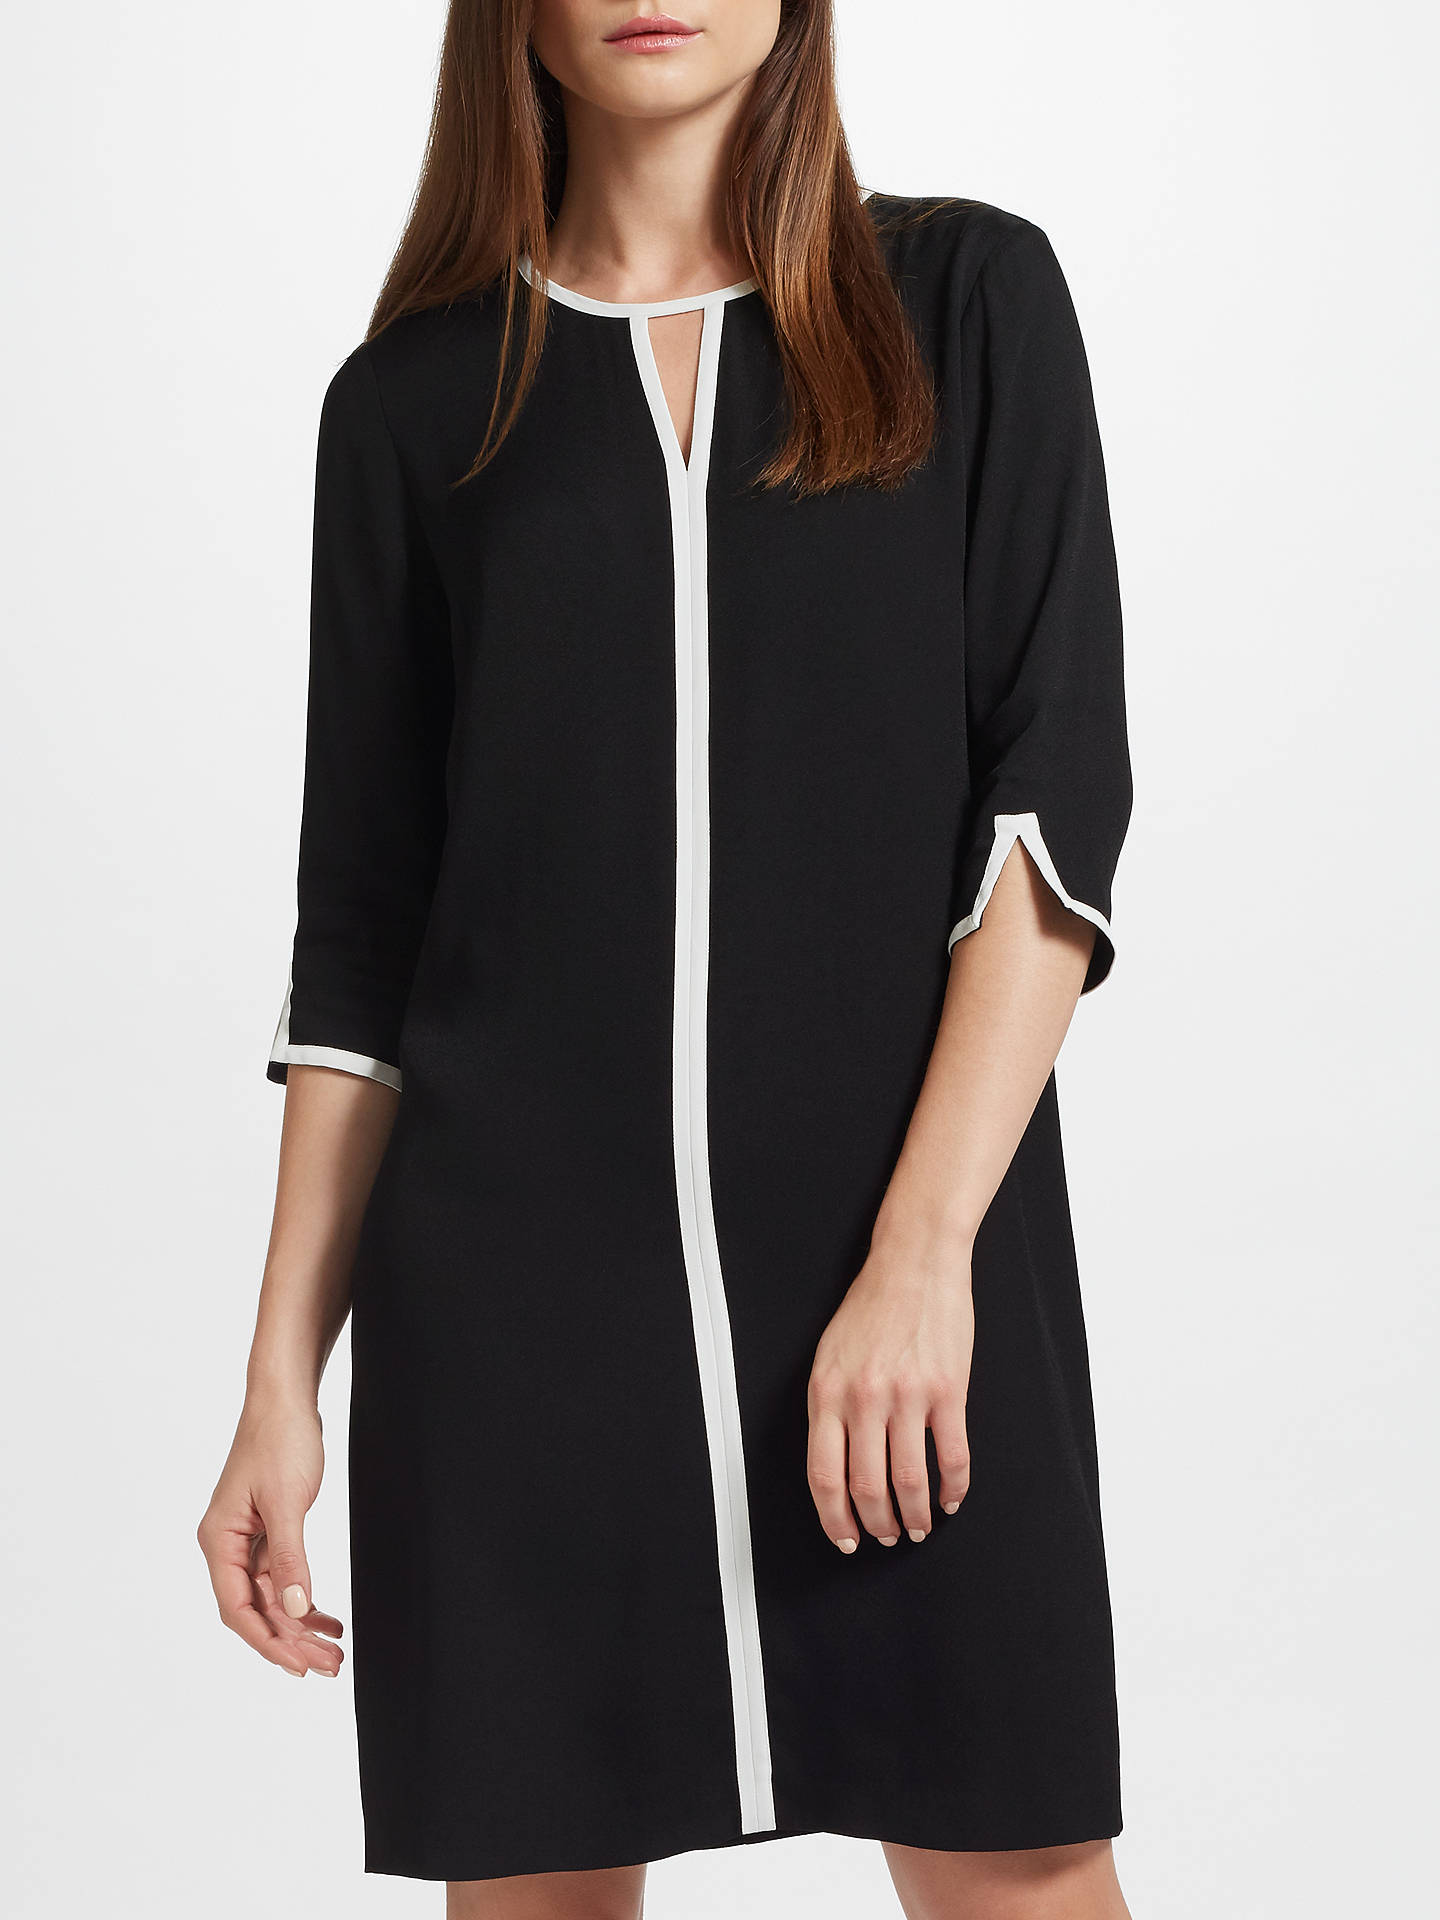 5698c67d79f0 Buy John Lewis   Partners Tipped Shift Dress